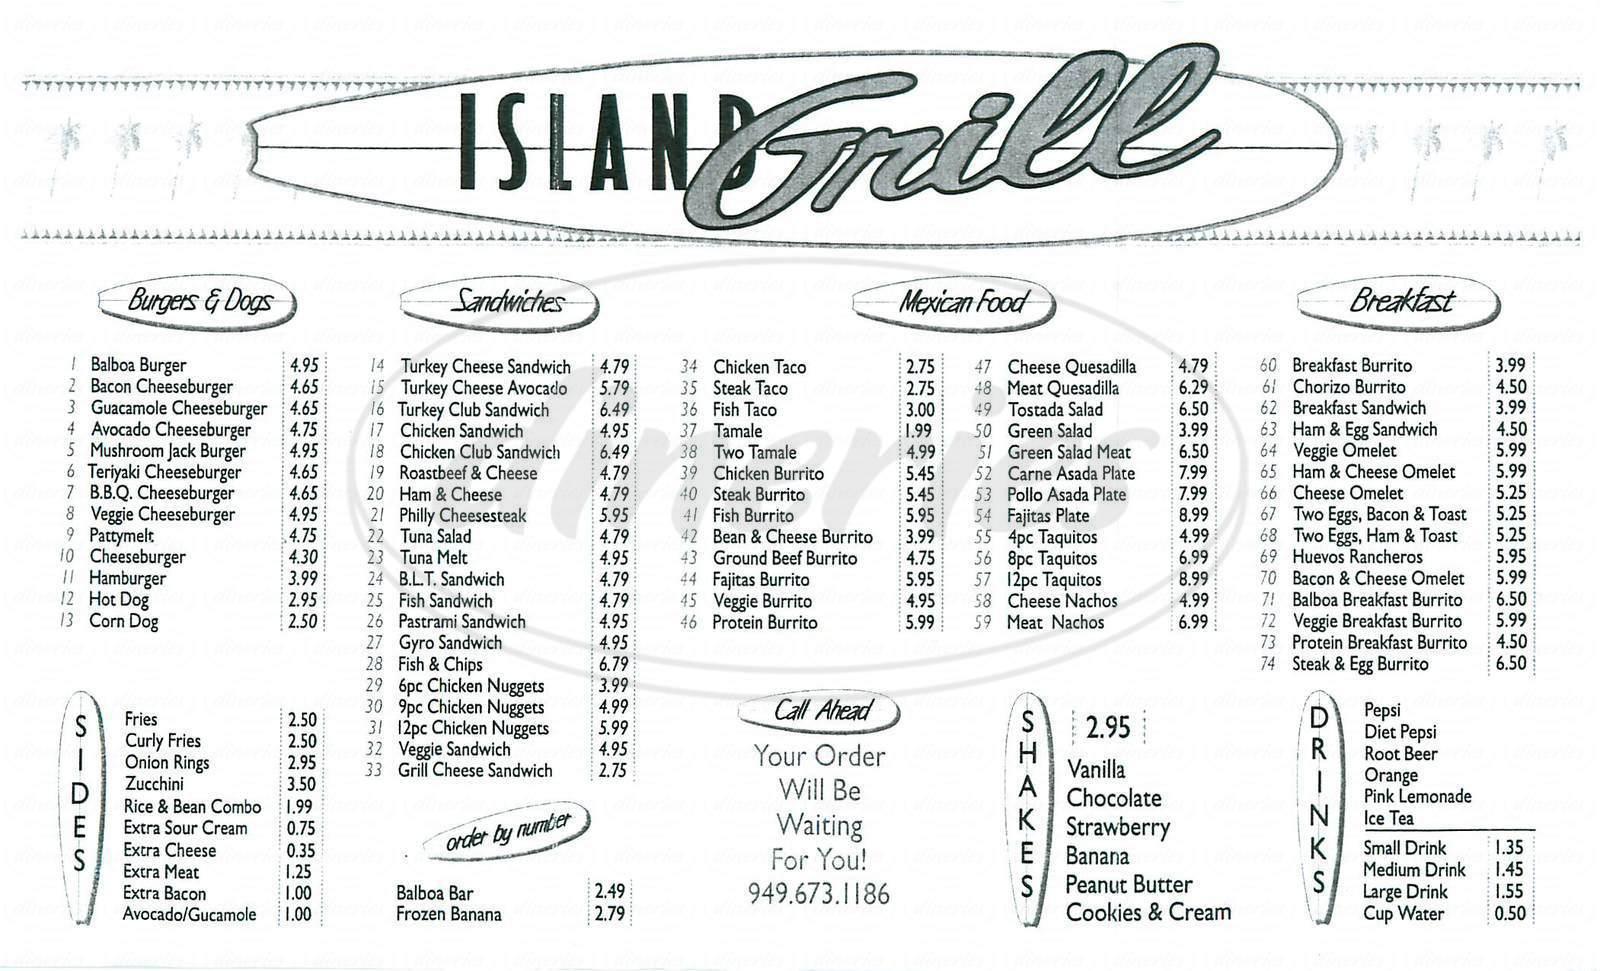 menu for Island Grill